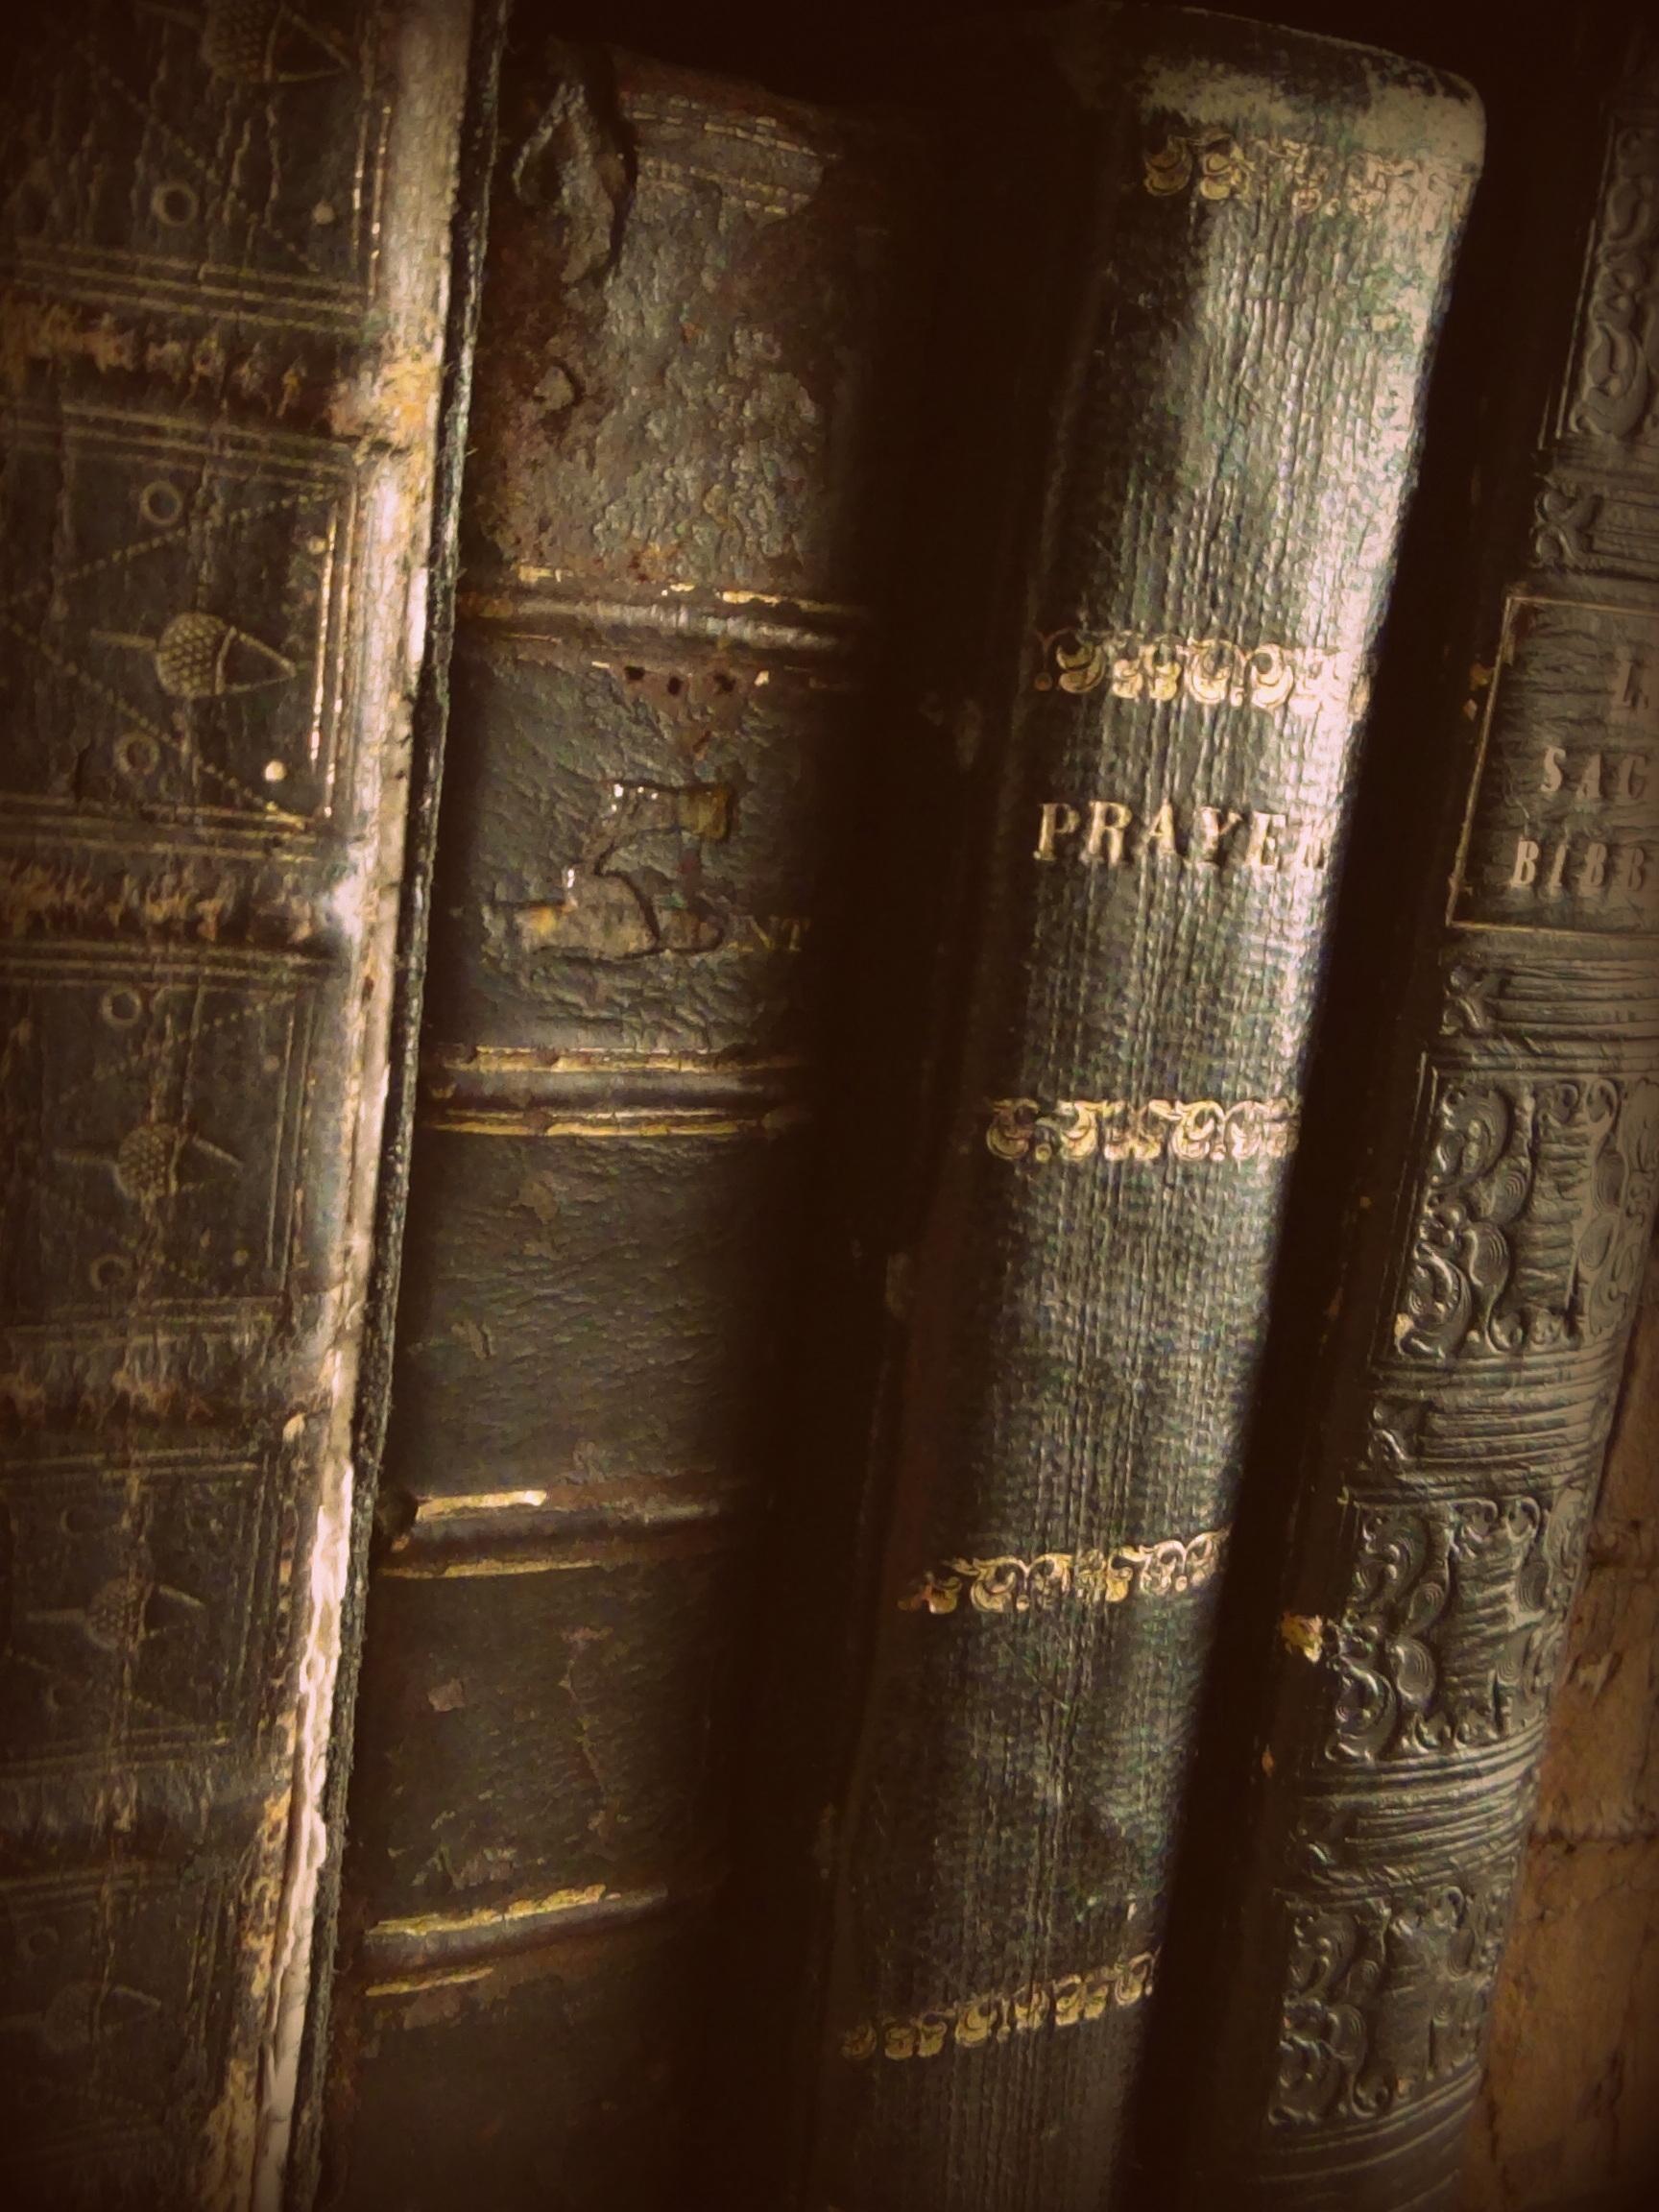 Old books © 2018 Simon Peter Sutherland